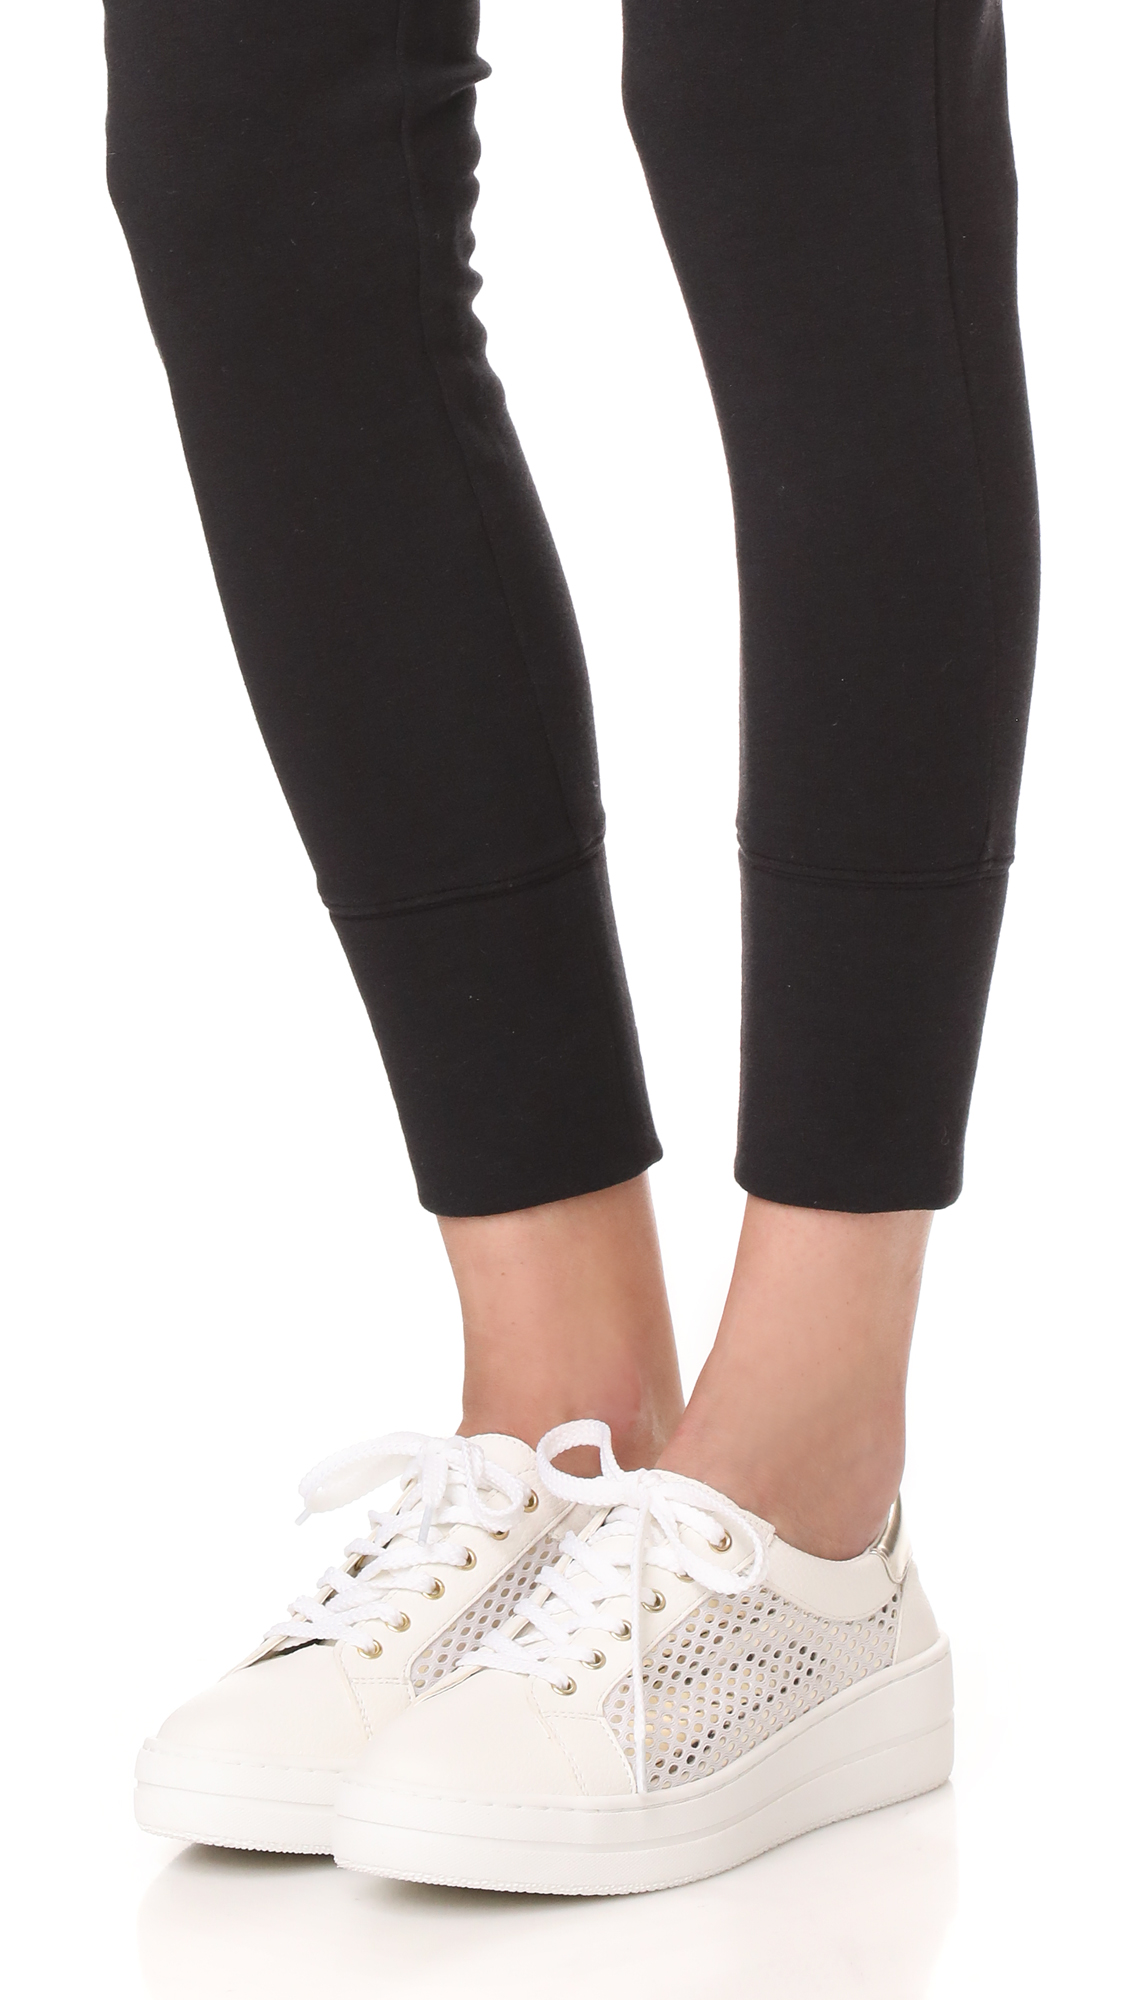 90d98c190fd Steven Nyssa Lace Up Sneakers